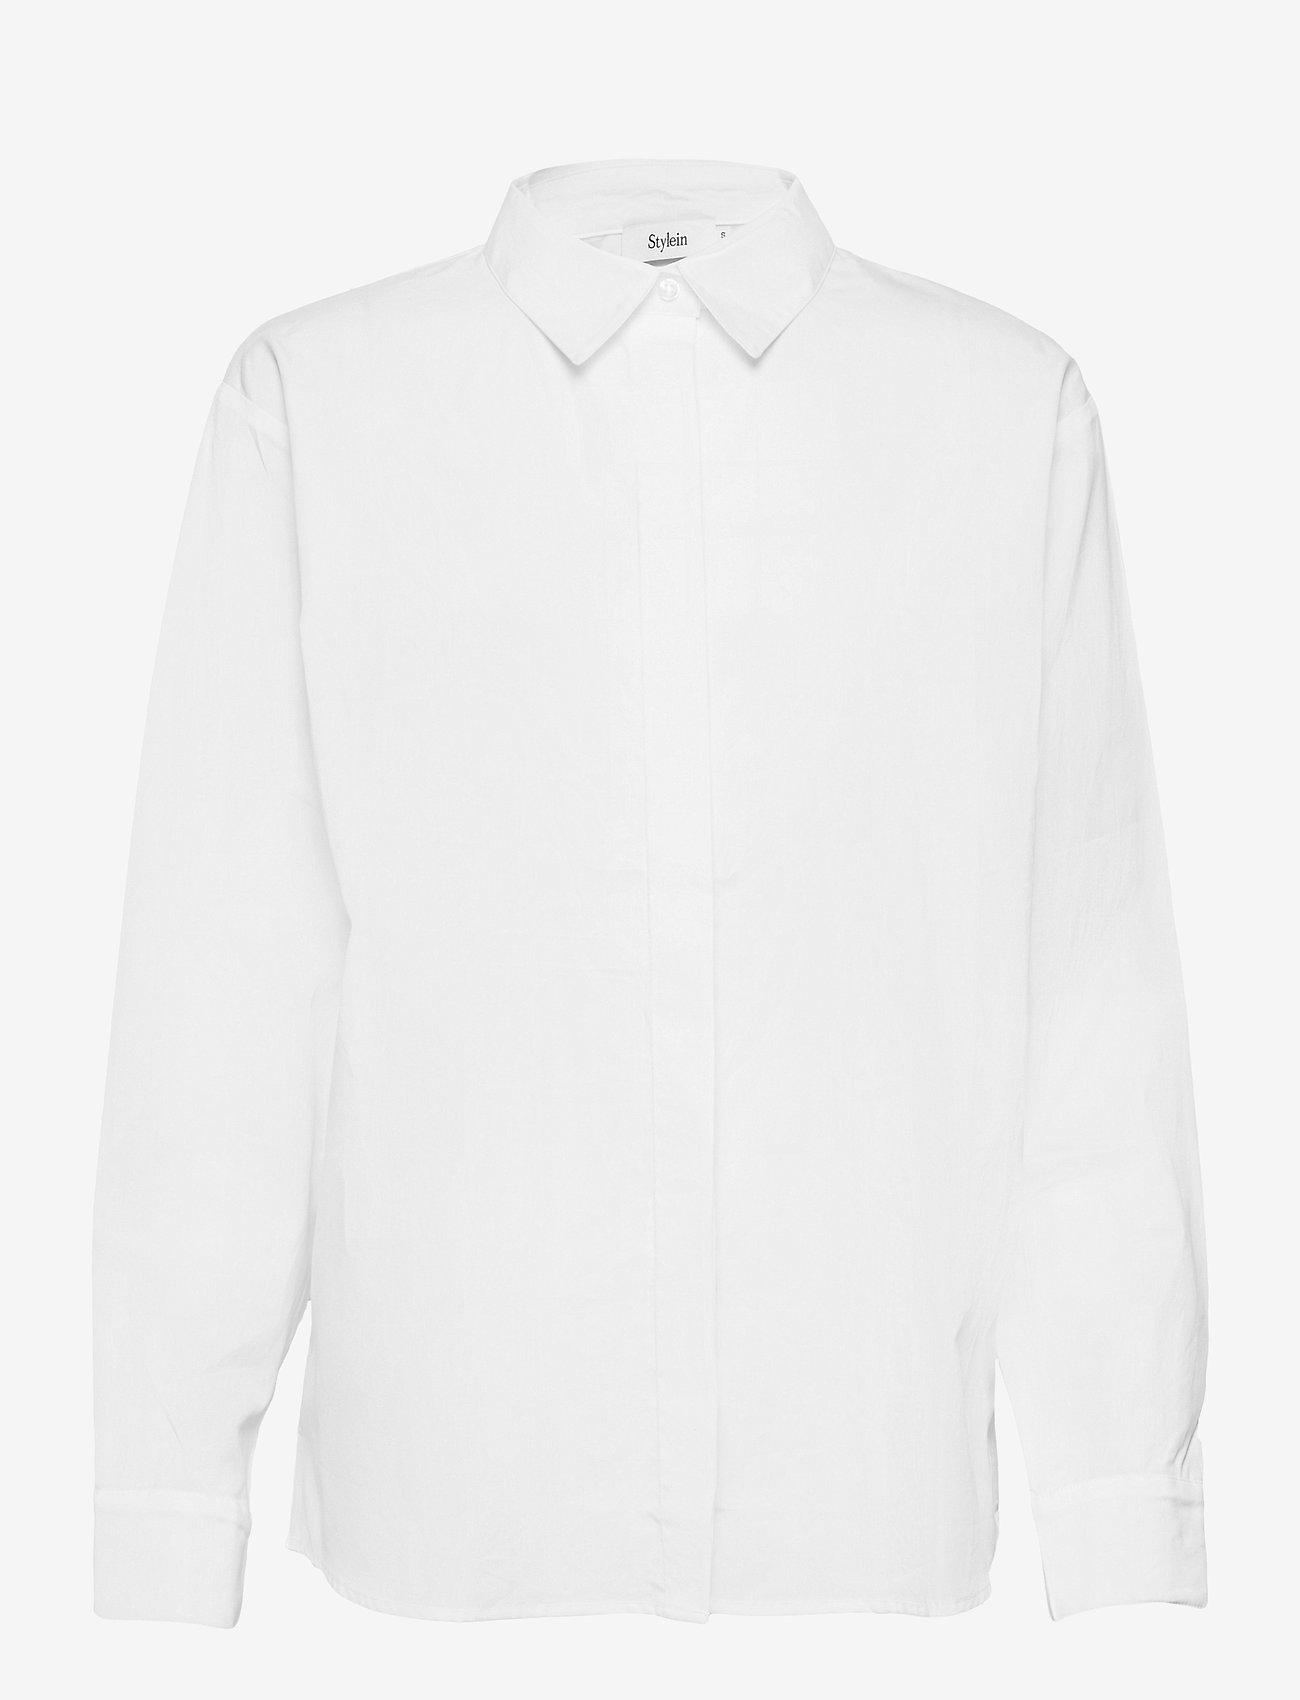 Stylein - JACKIE SHIRT - džinsa krekli - white - 1